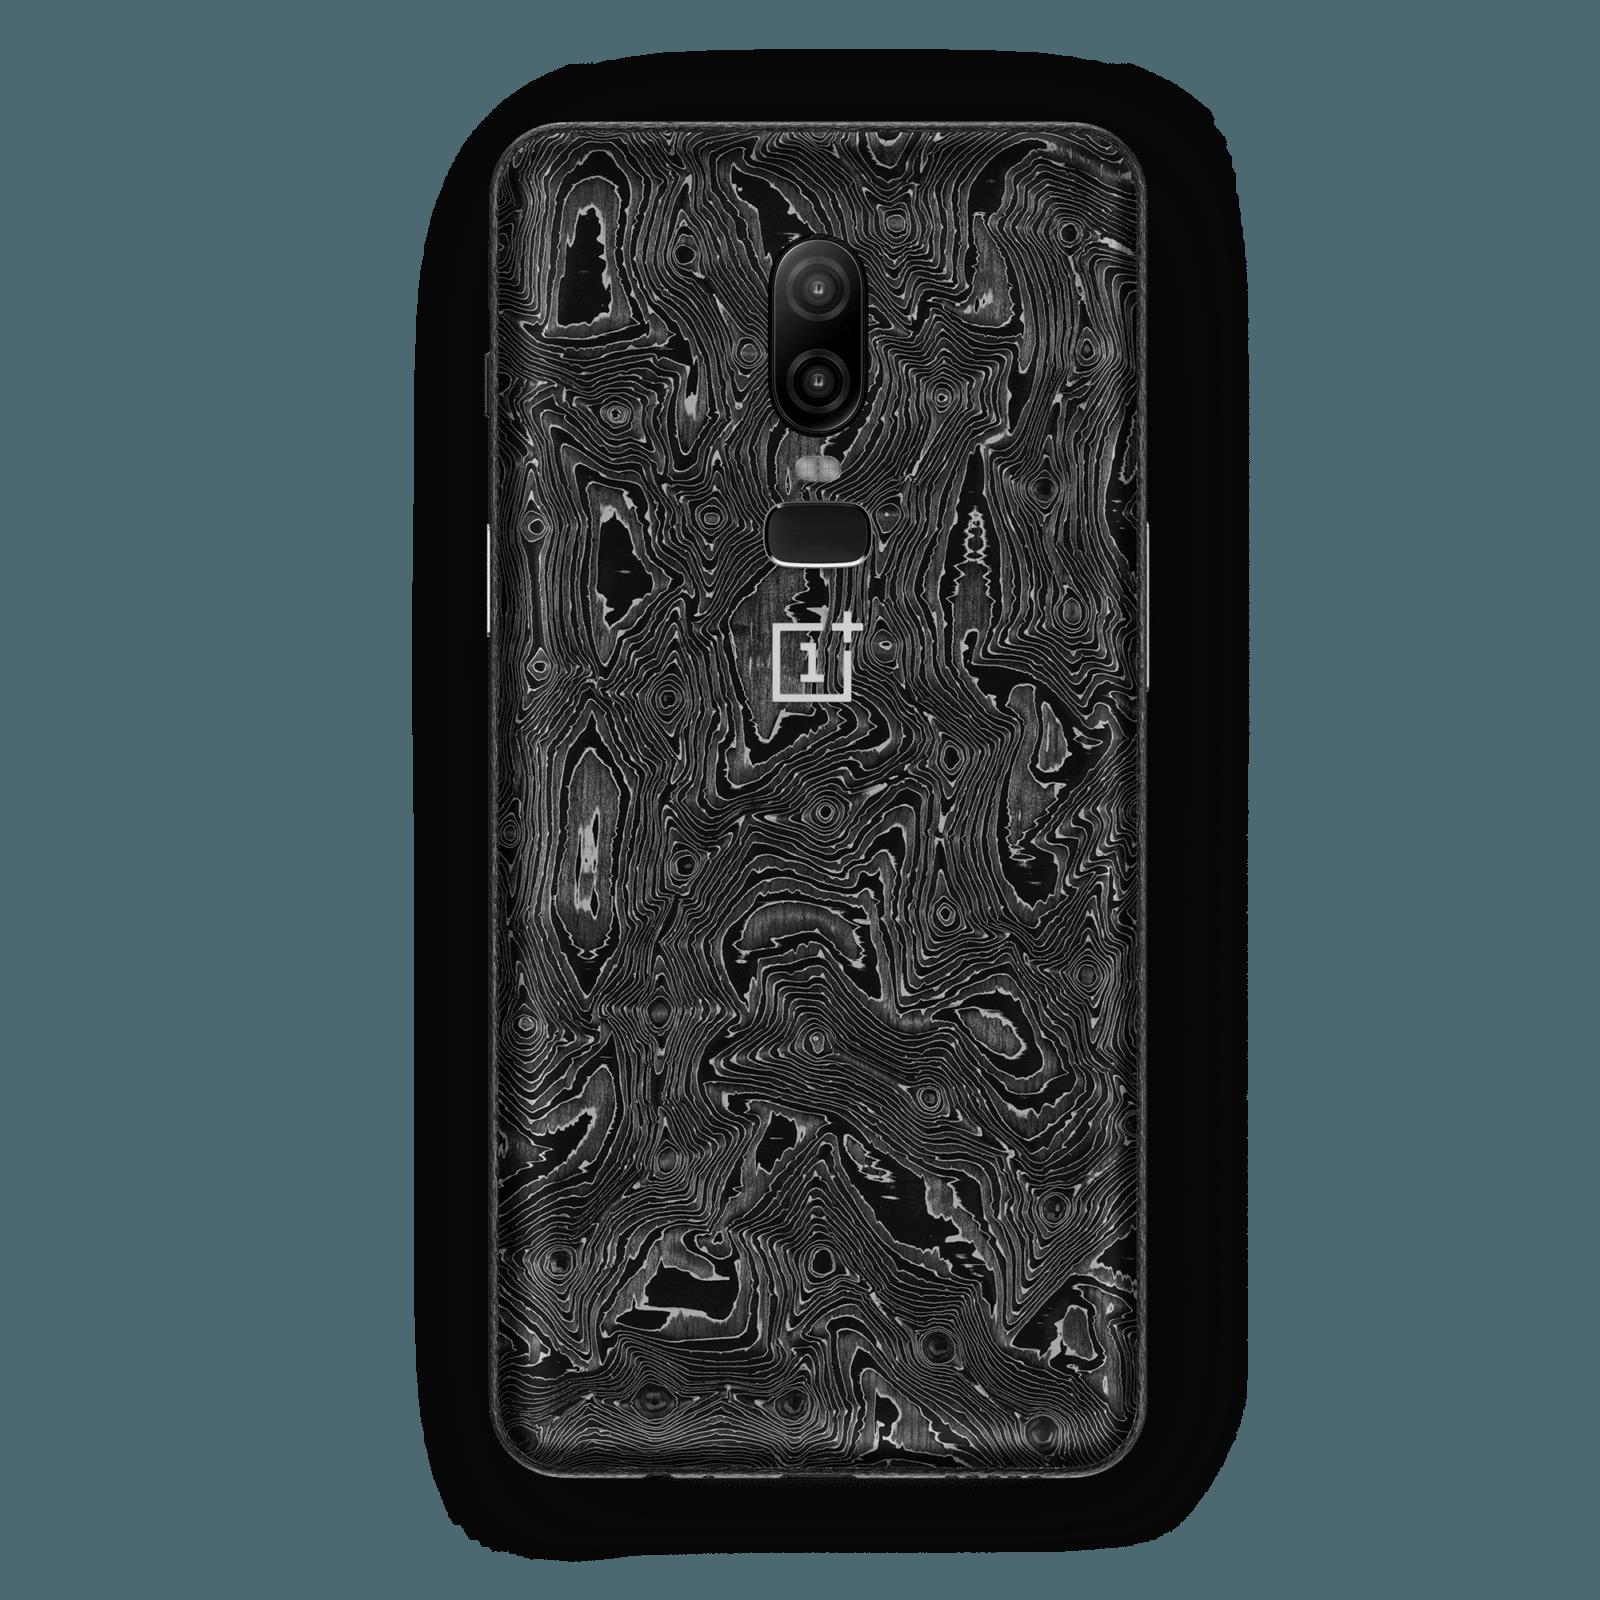 OnePlus & Hadoro Edition | Evosmart.it